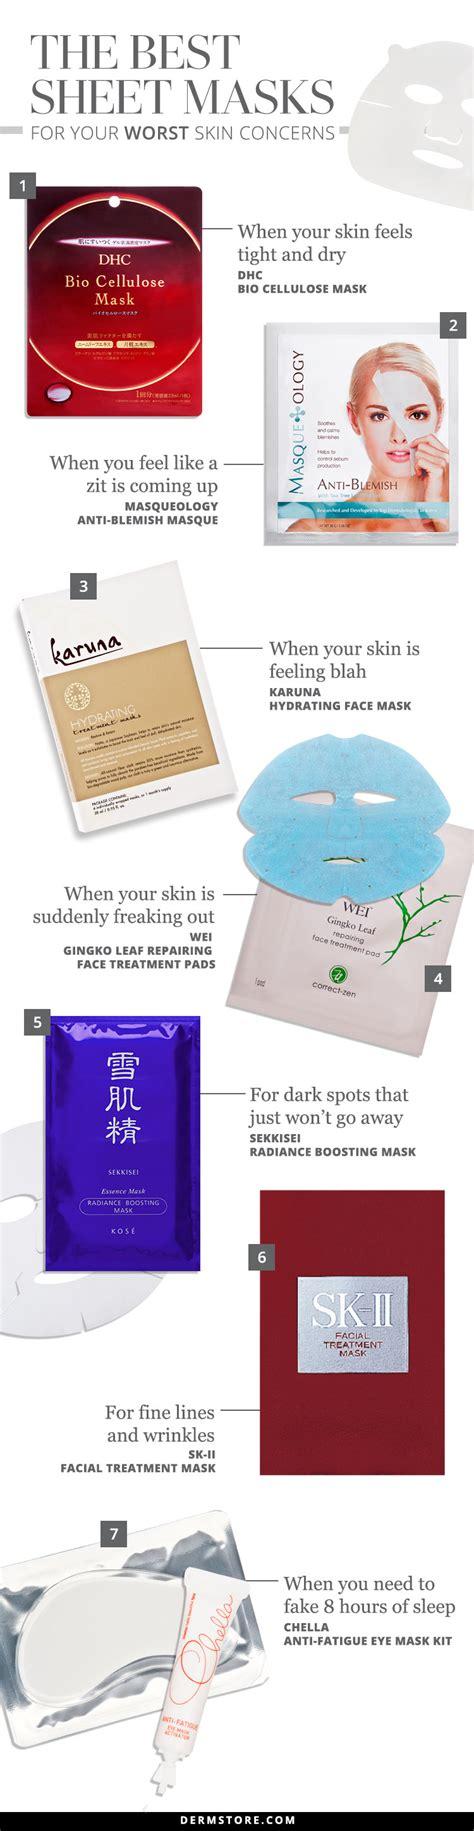 15 best sheet masks for your face top face sheet mask reviews best sheet masks for your worst skin concerns dermstore blog